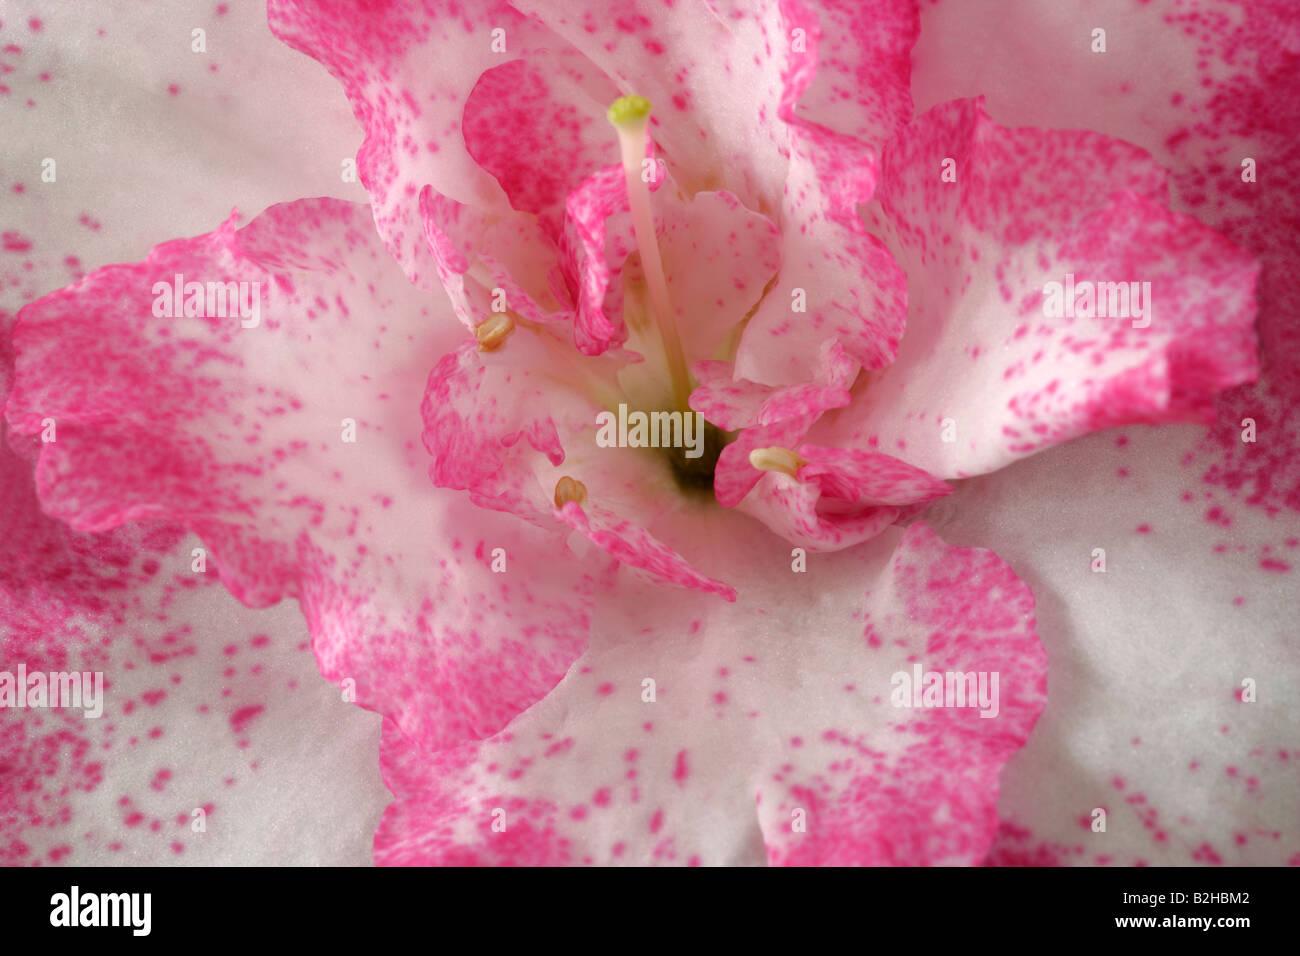 Azaleas flowering shrub afterimage backcloth background image backdrop close up pattern still patterns stills - Stock Image